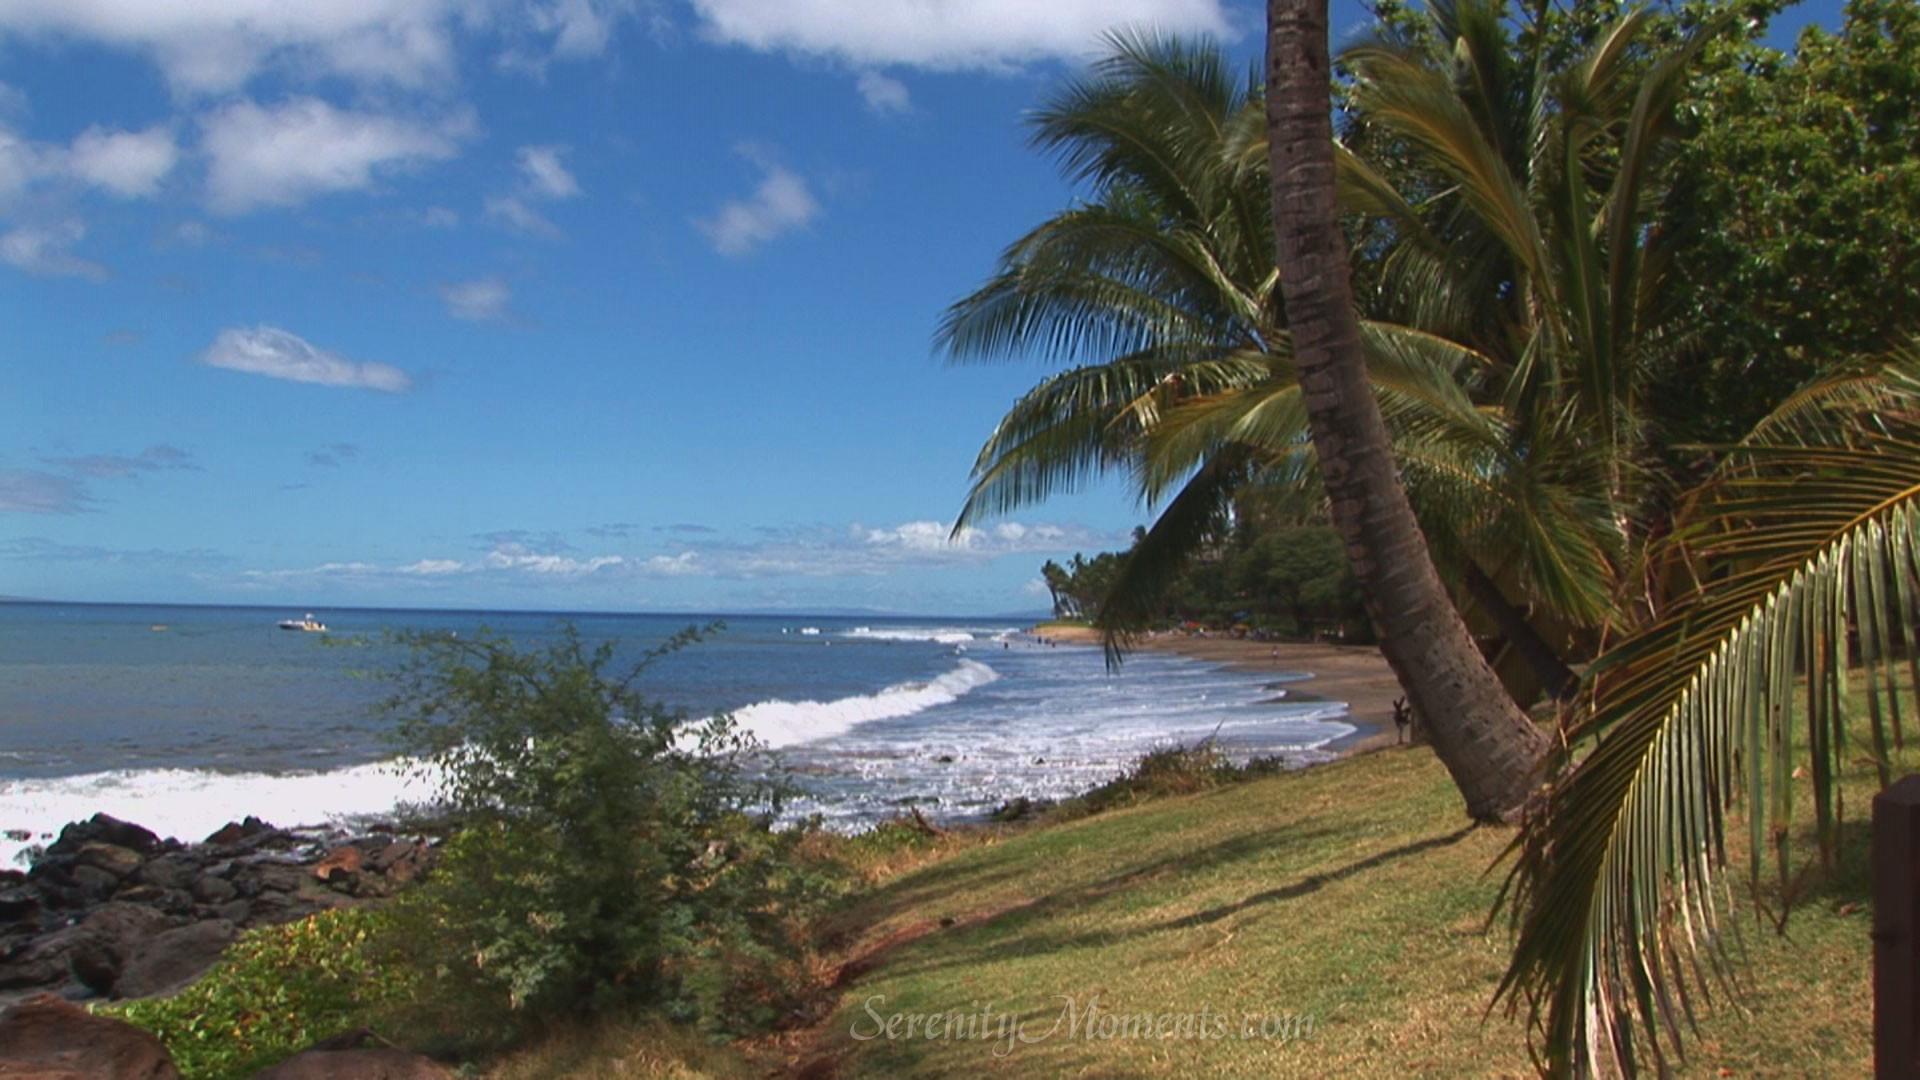 screensavers, wallpaper, tropical, screensaver, beach, mauai